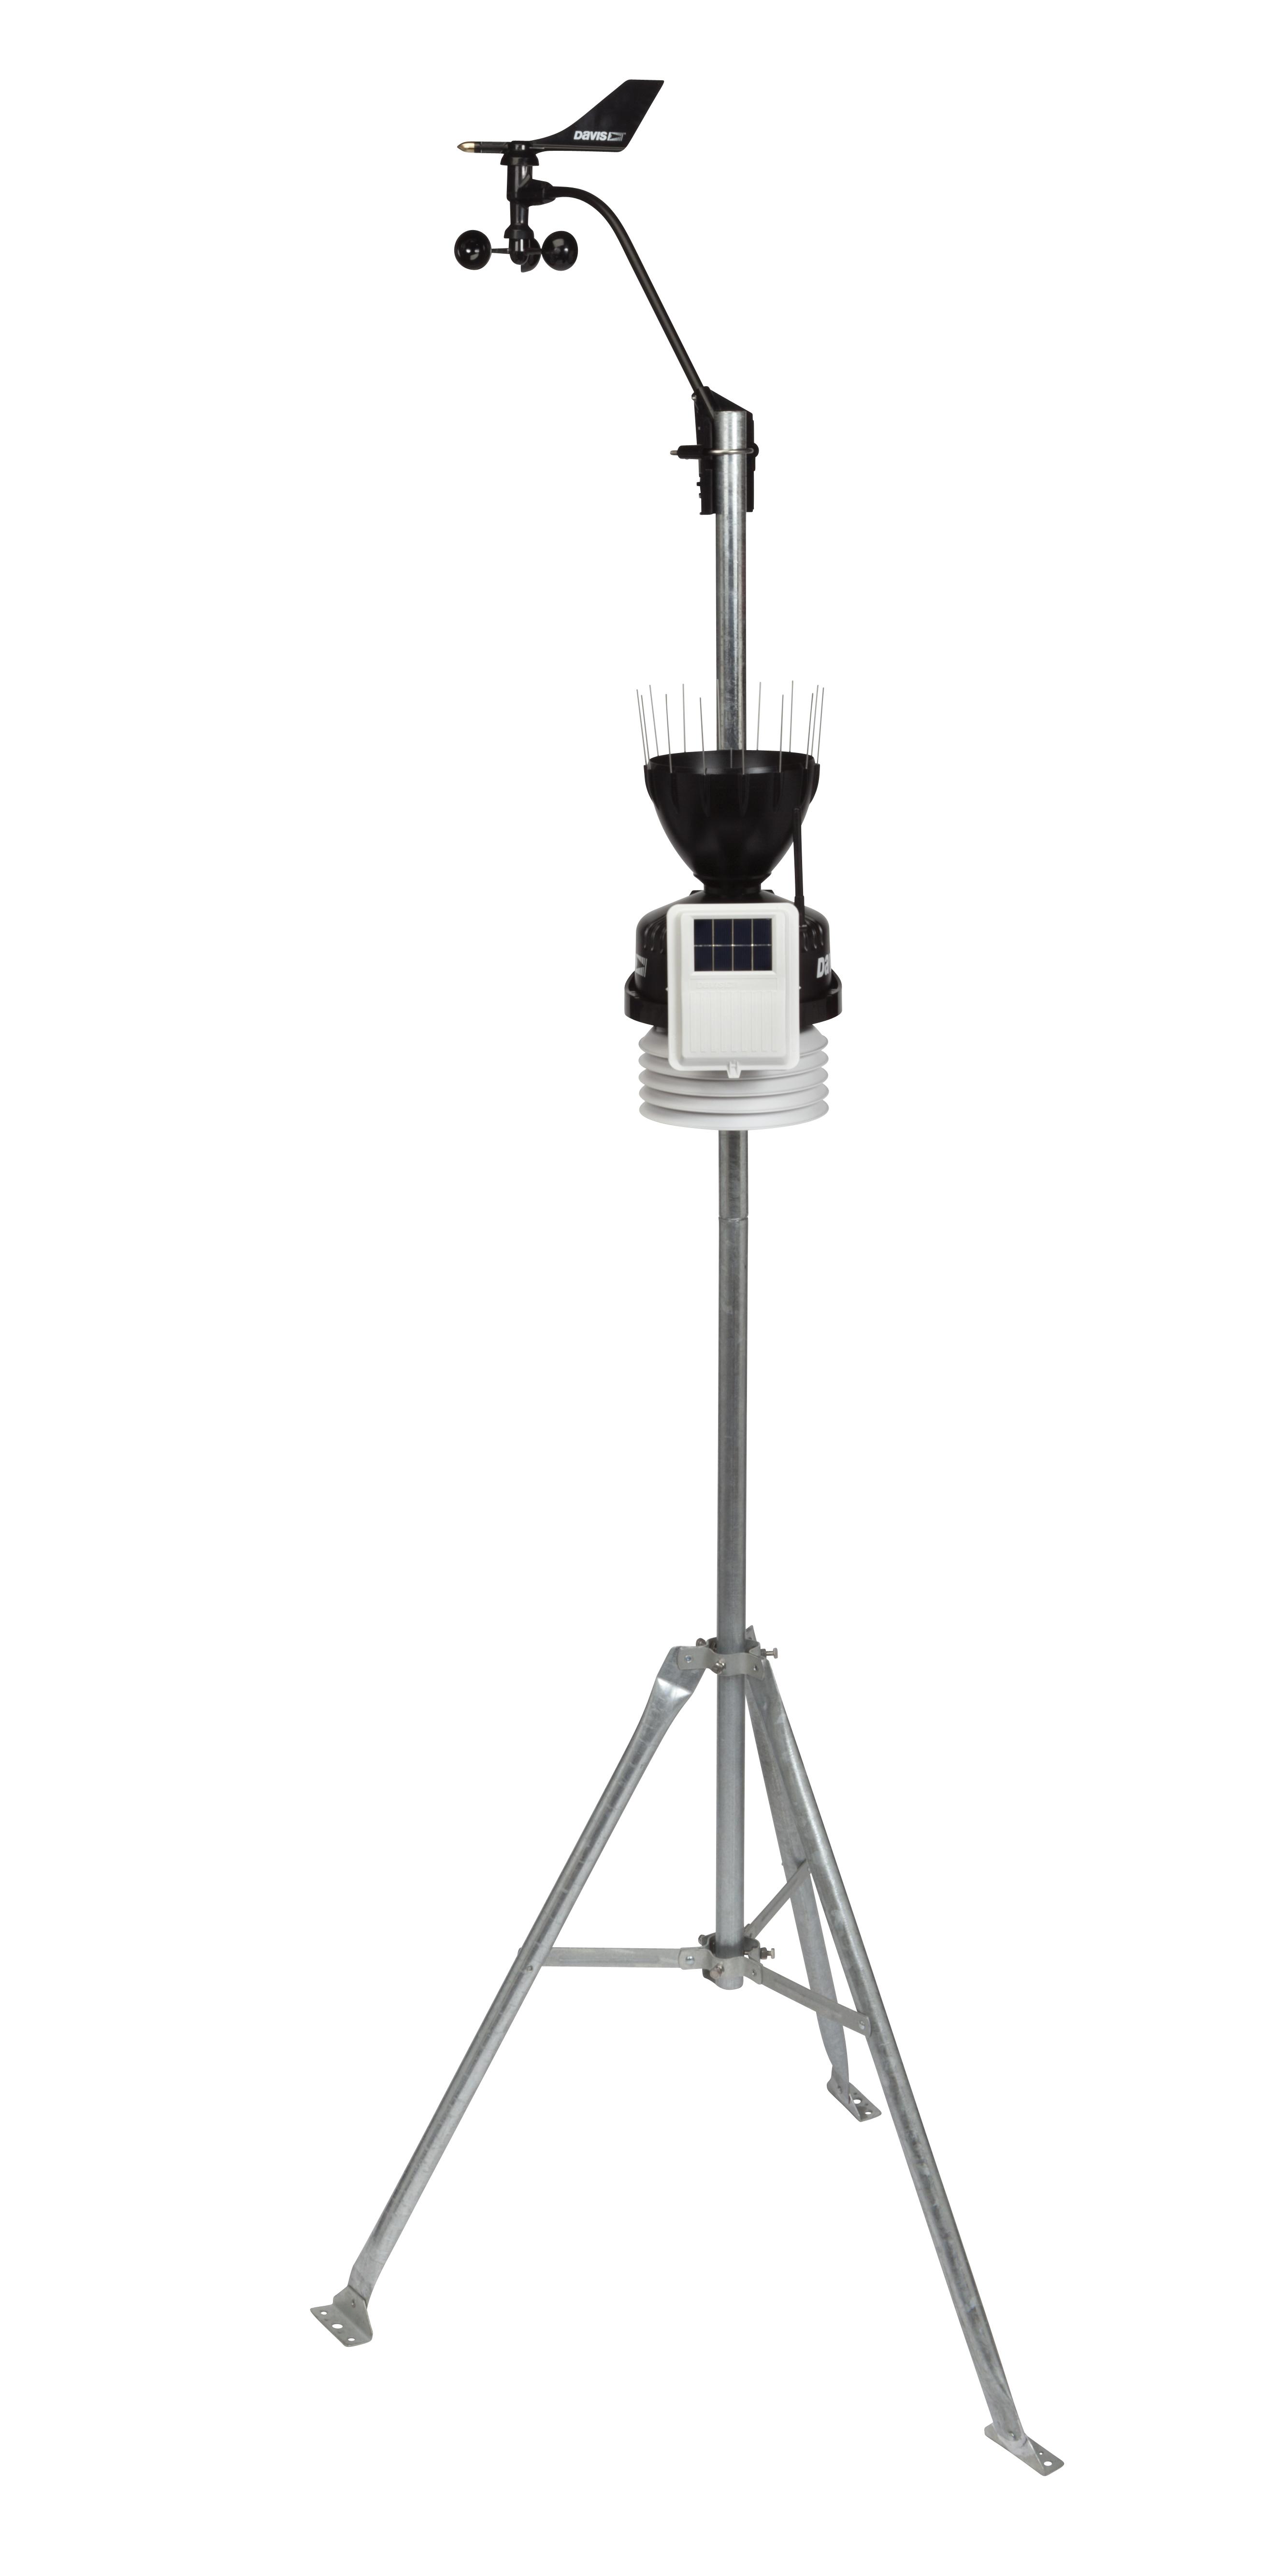 davis instruments 6152 wireless vantage pro2 with standard radiation shield